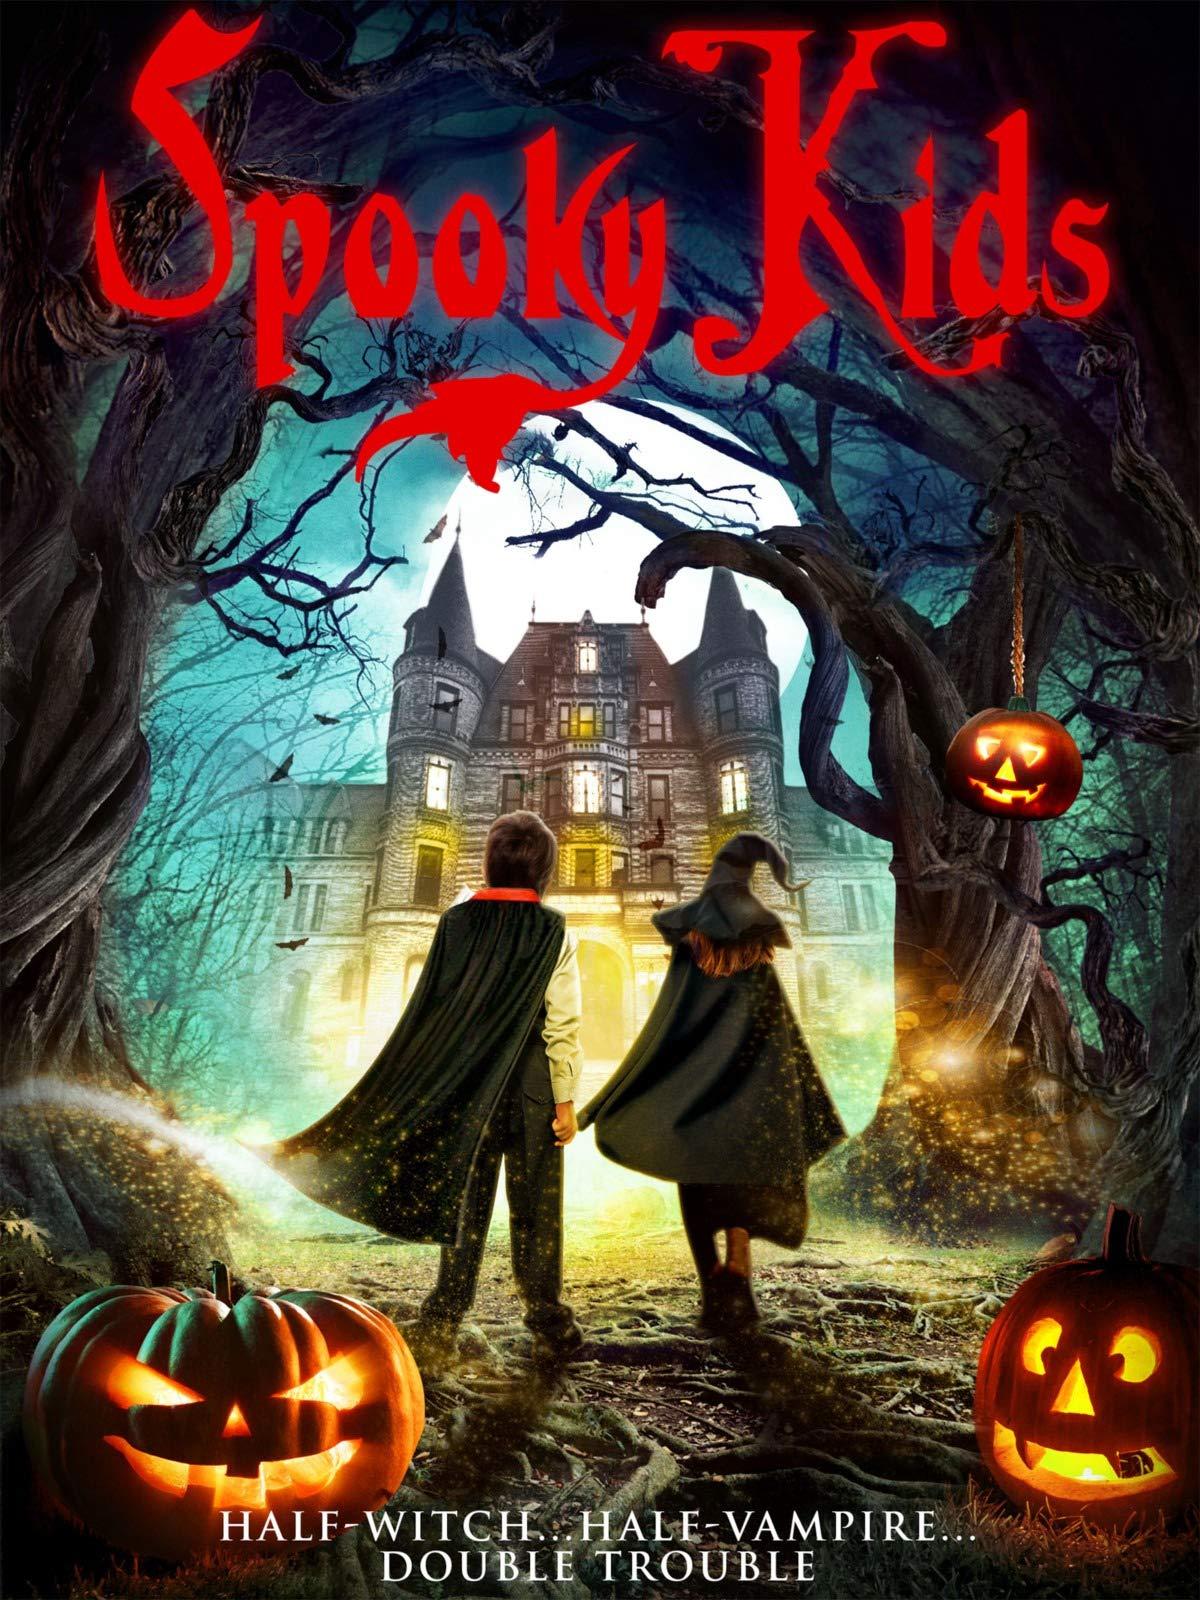 Spooky Kids on Amazon Prime Video UK